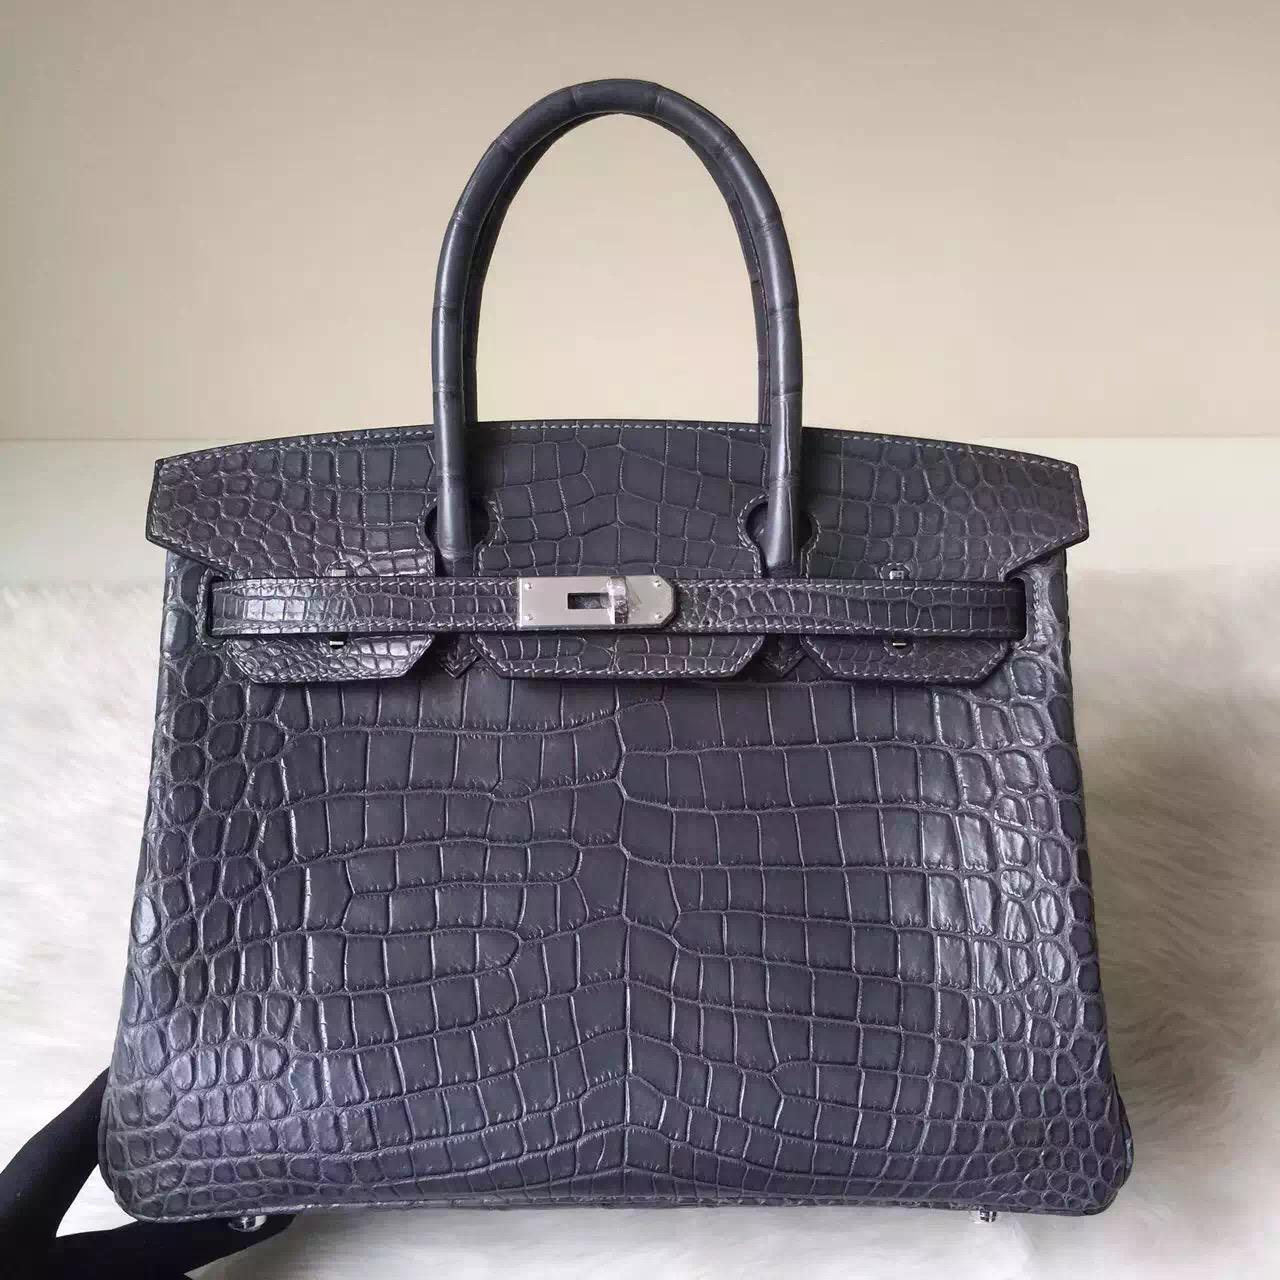 Discount Hermes Birkin Bag30cm in 8F Etain Grey Crocodile Matt Leather